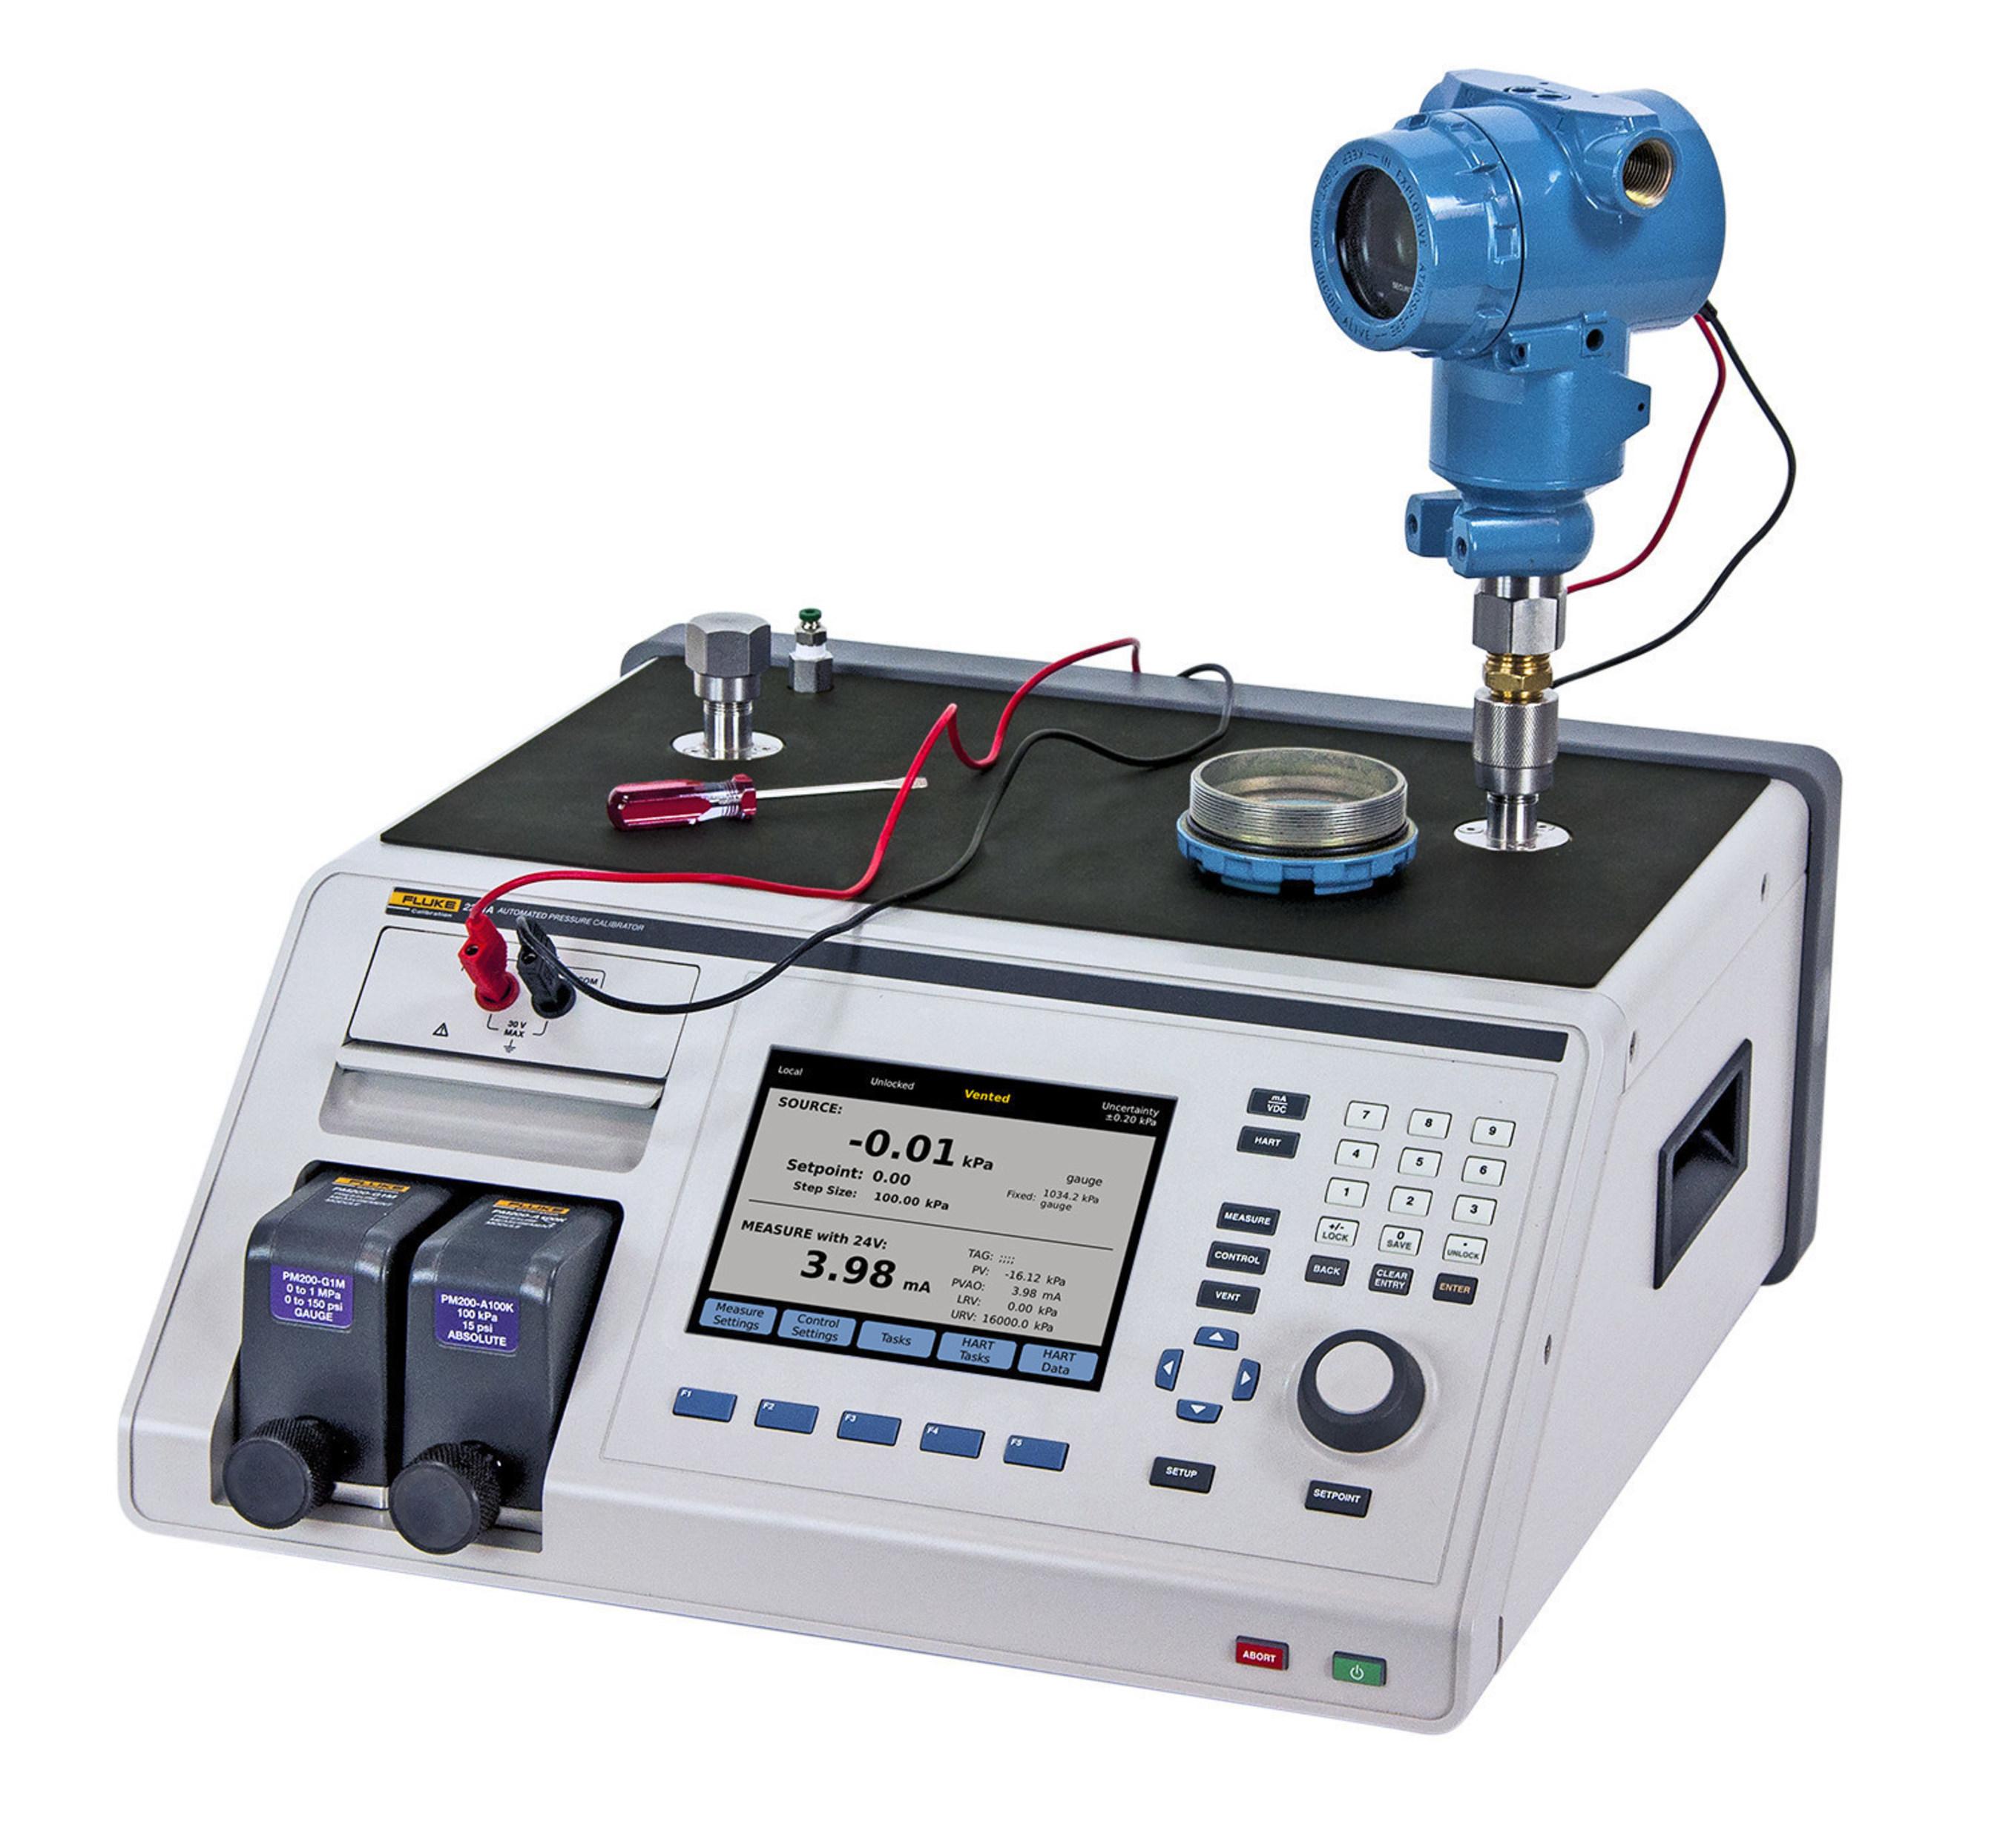 Easy More Comprehensive: Fluke Calibration 2271A Industrial Pressure Calibrator